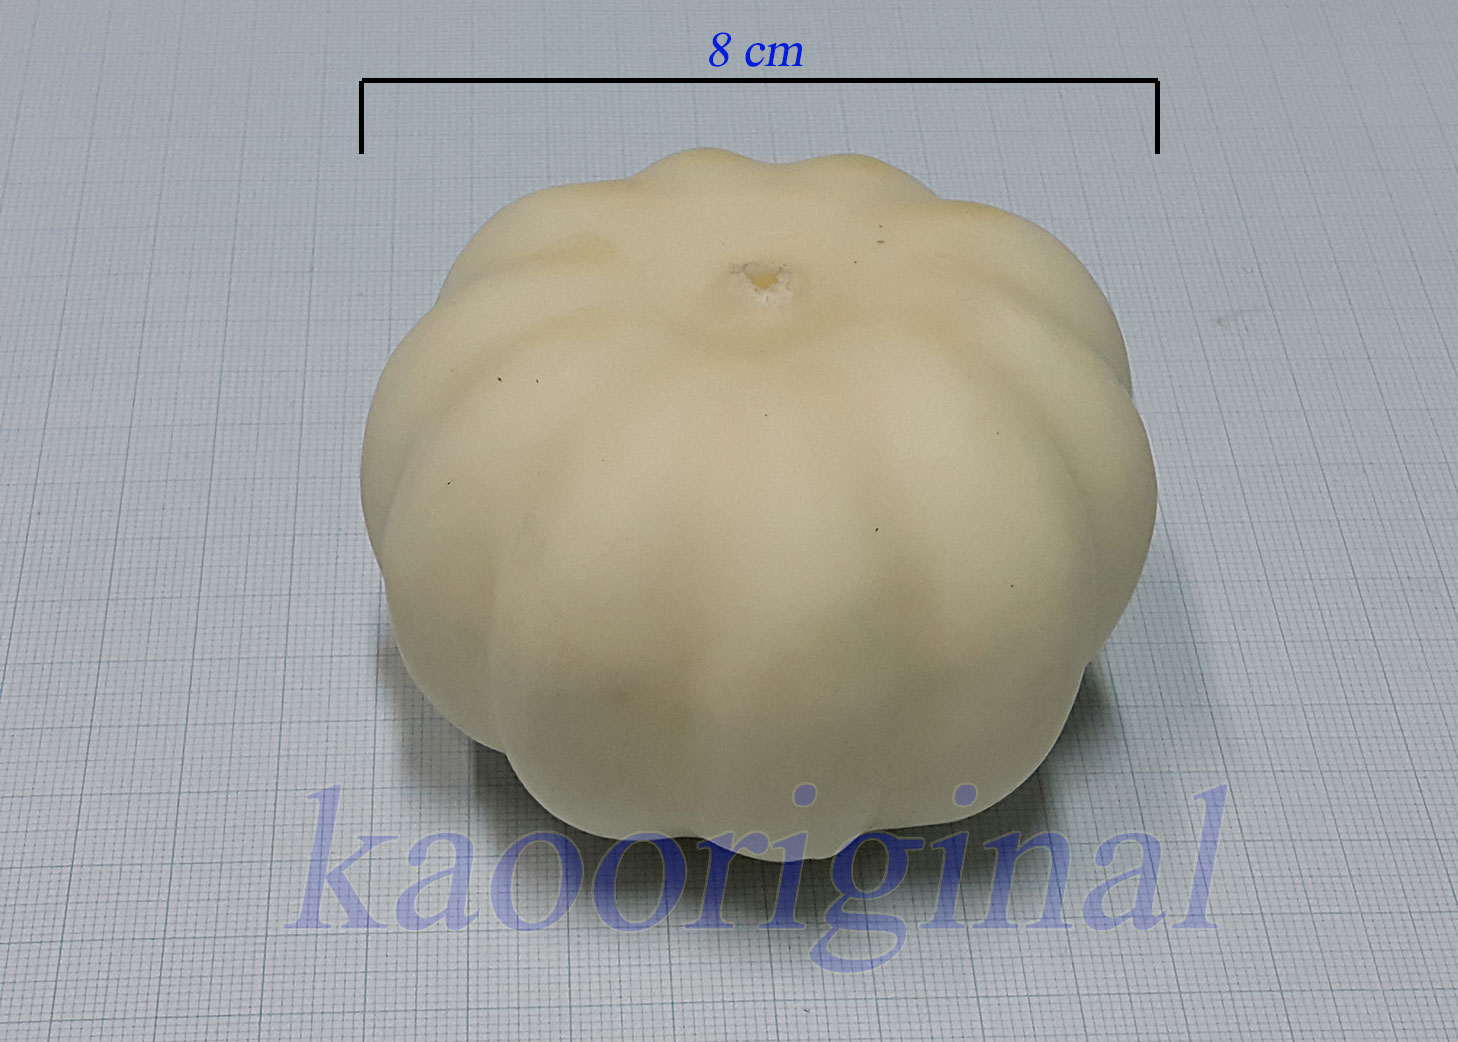 Artificial pumpkin 8 cm <br> ฟักทอง 8 cm <br> SKU: 9011 - 3 White cream